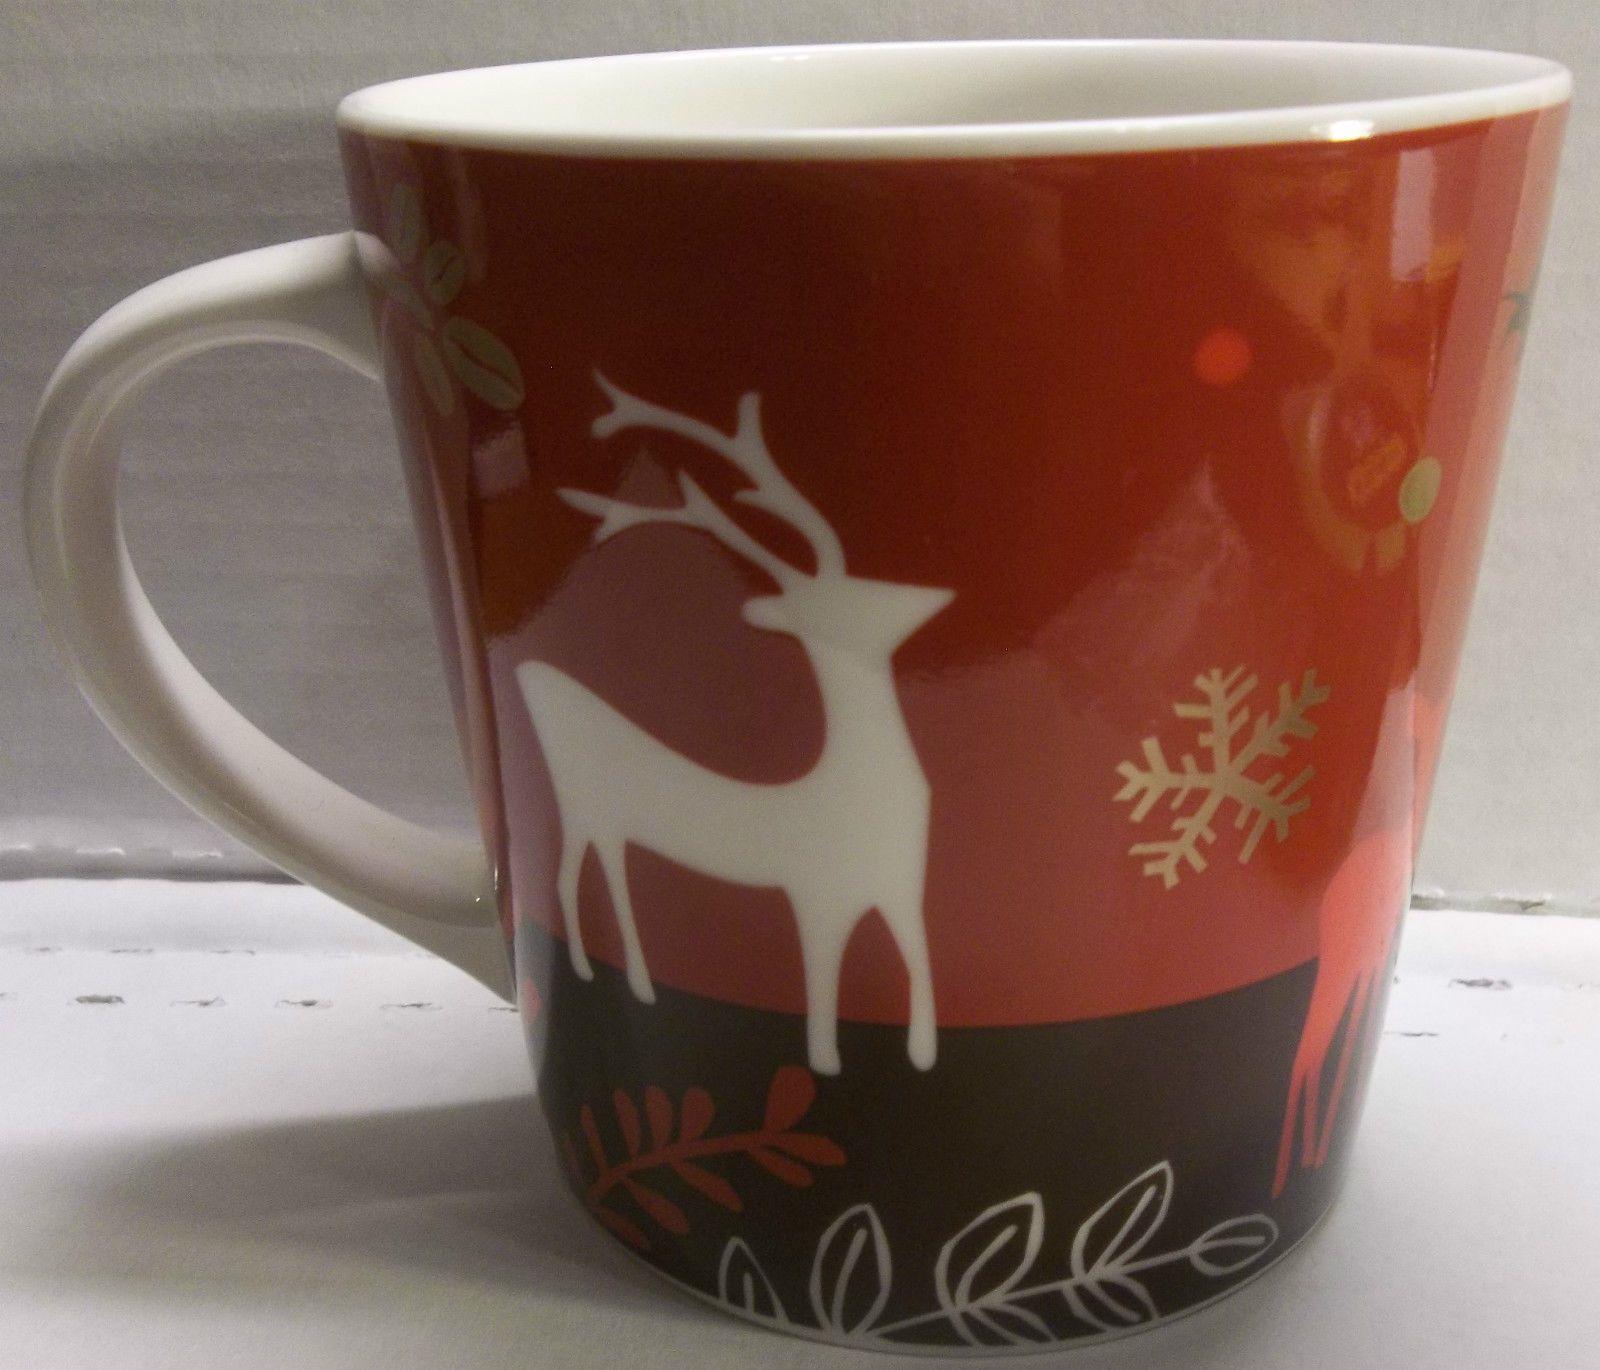 Red 2009 Starbucks Christmas Mug Reindeer Snowflakes Coffee Beans Deer Starbucks Christmas Mugs Starbucks Christmas Christmas Mugs